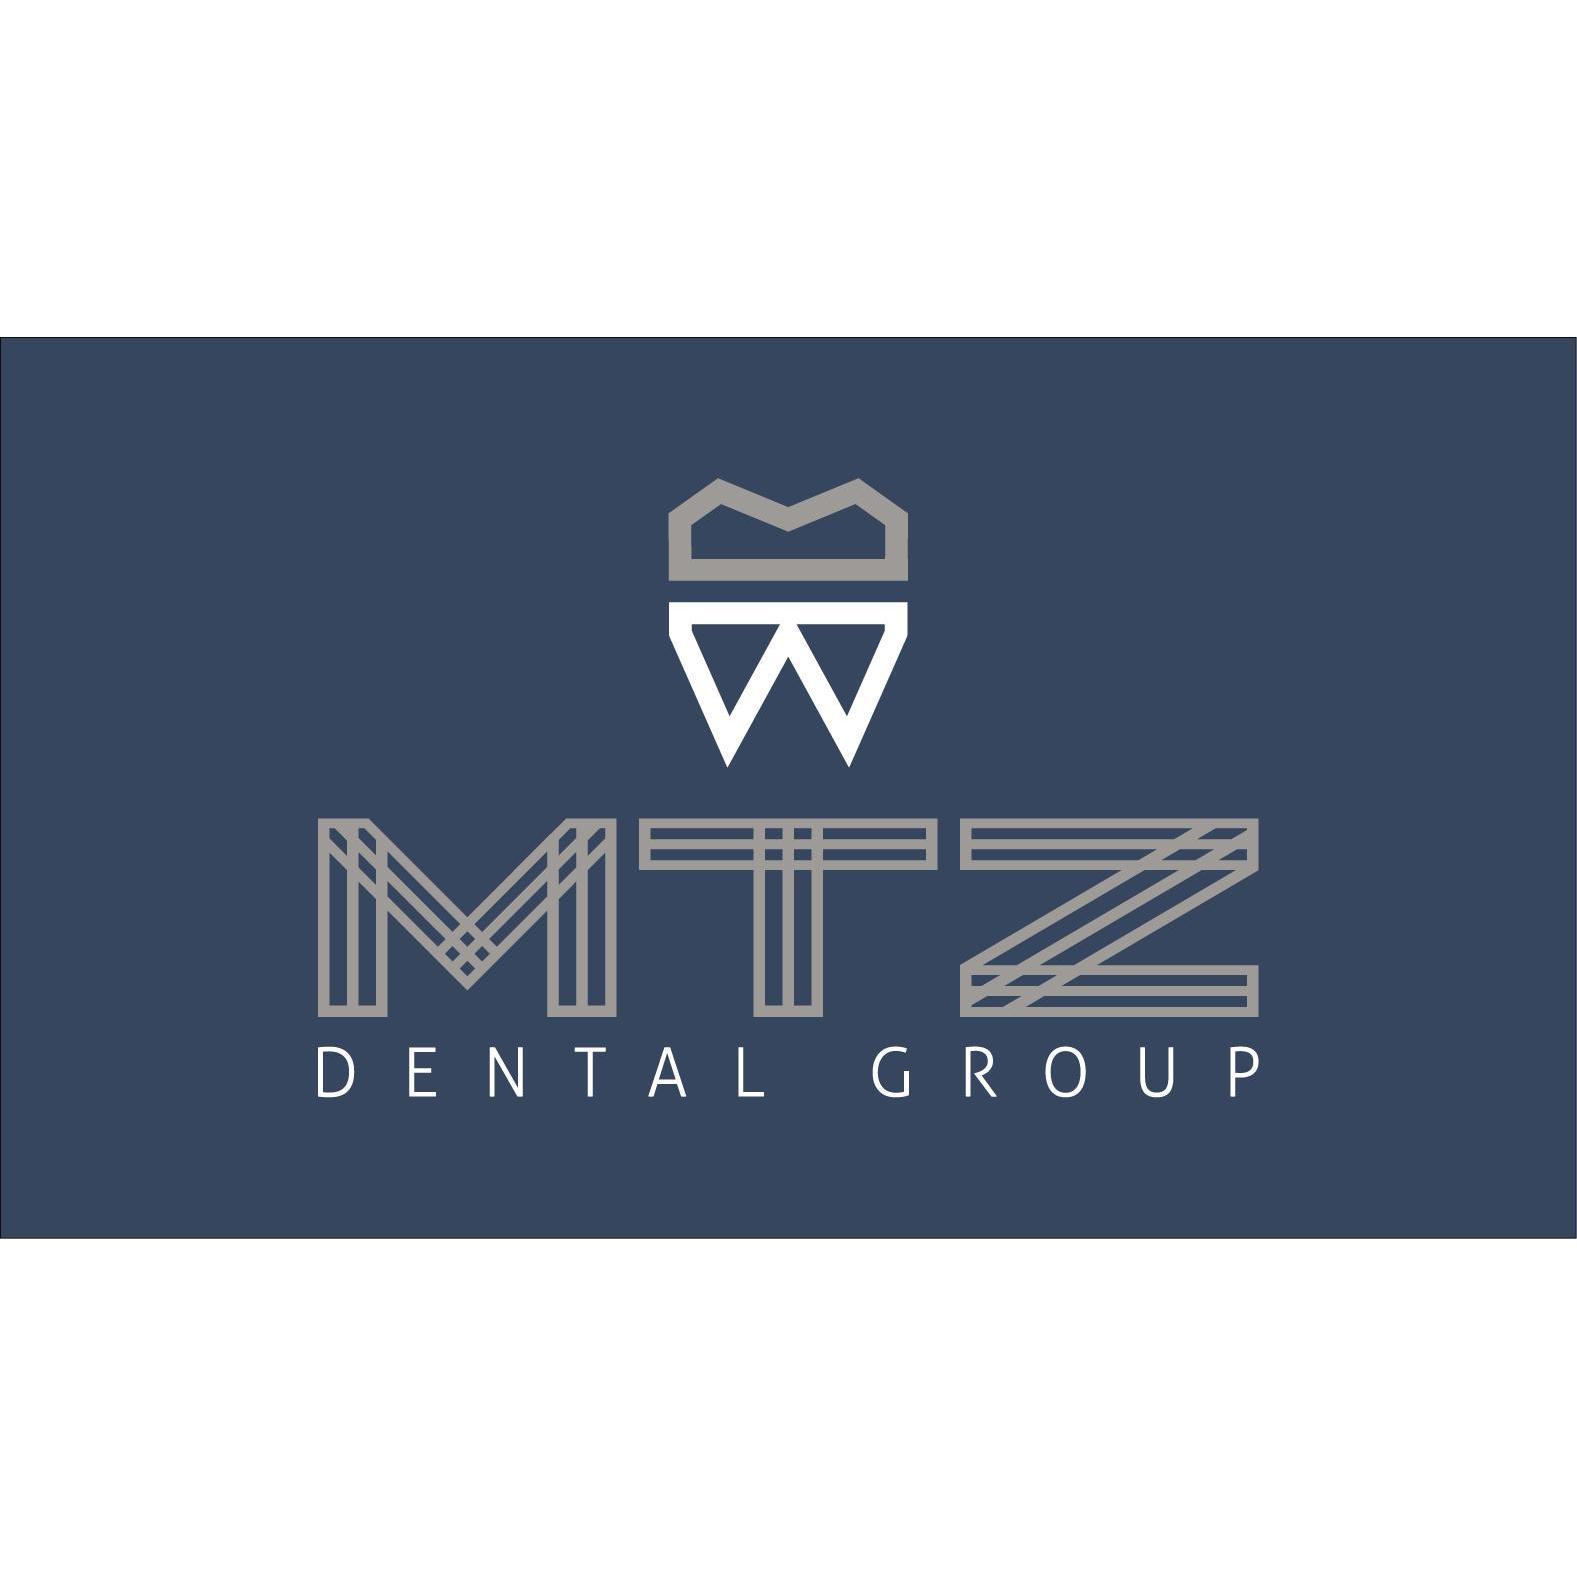 Martinez Dental Group - San Benito, TX - Dentists & Dental Services